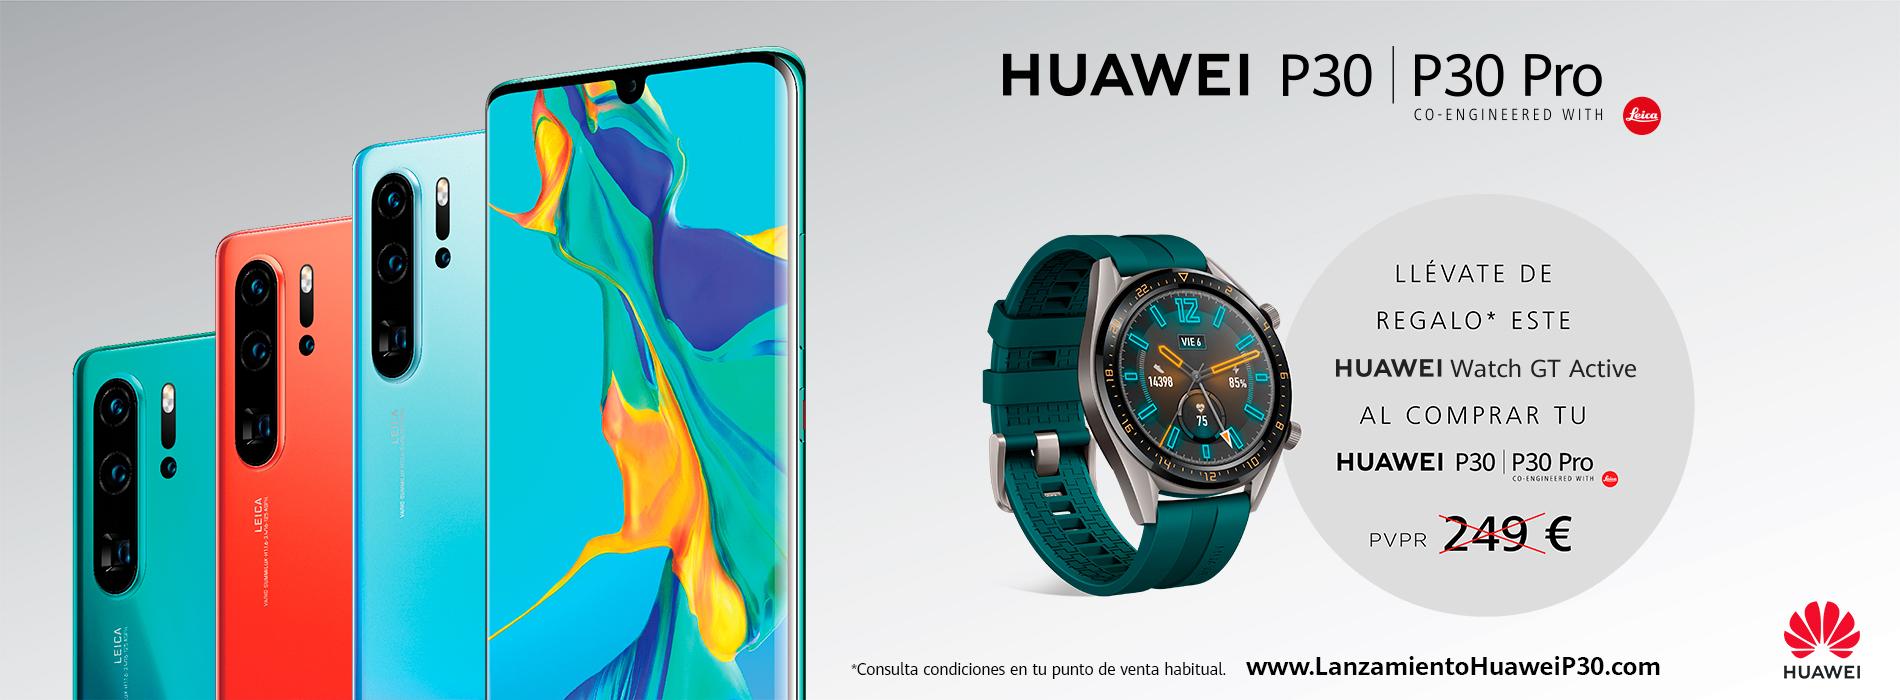 Huawei P30 Pro (3)